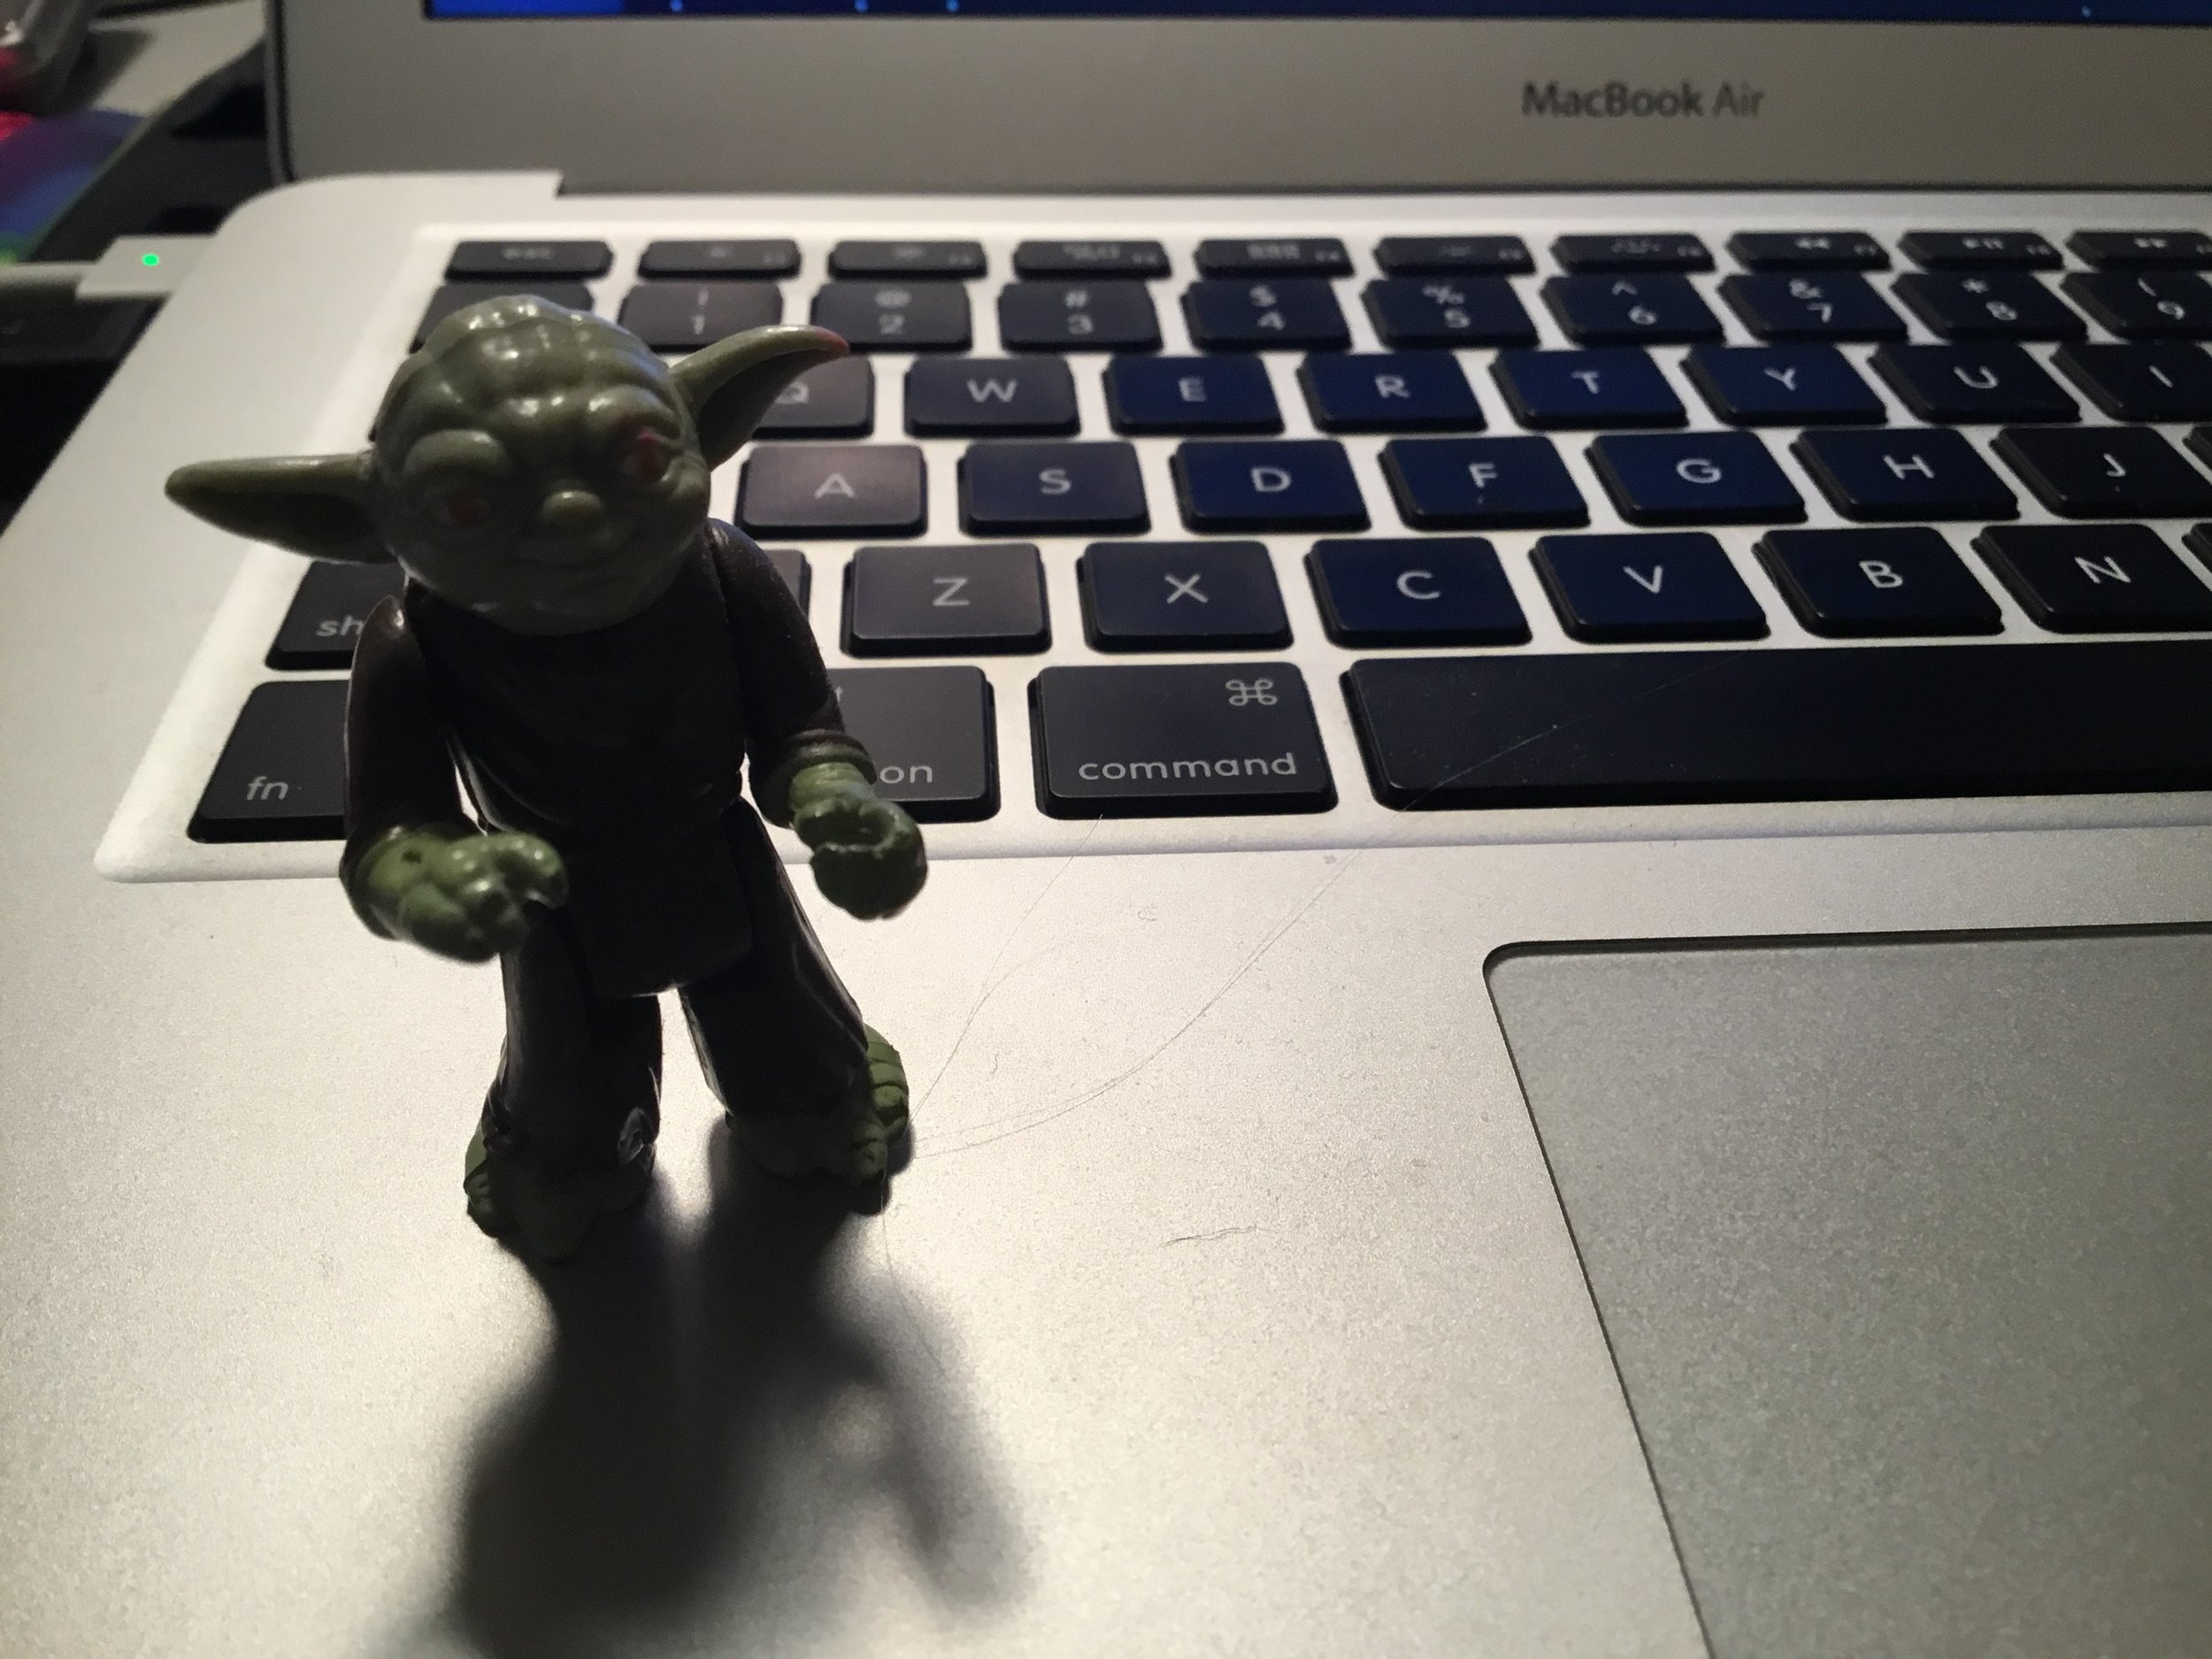 Sherry Howard Yoda pic.jpg